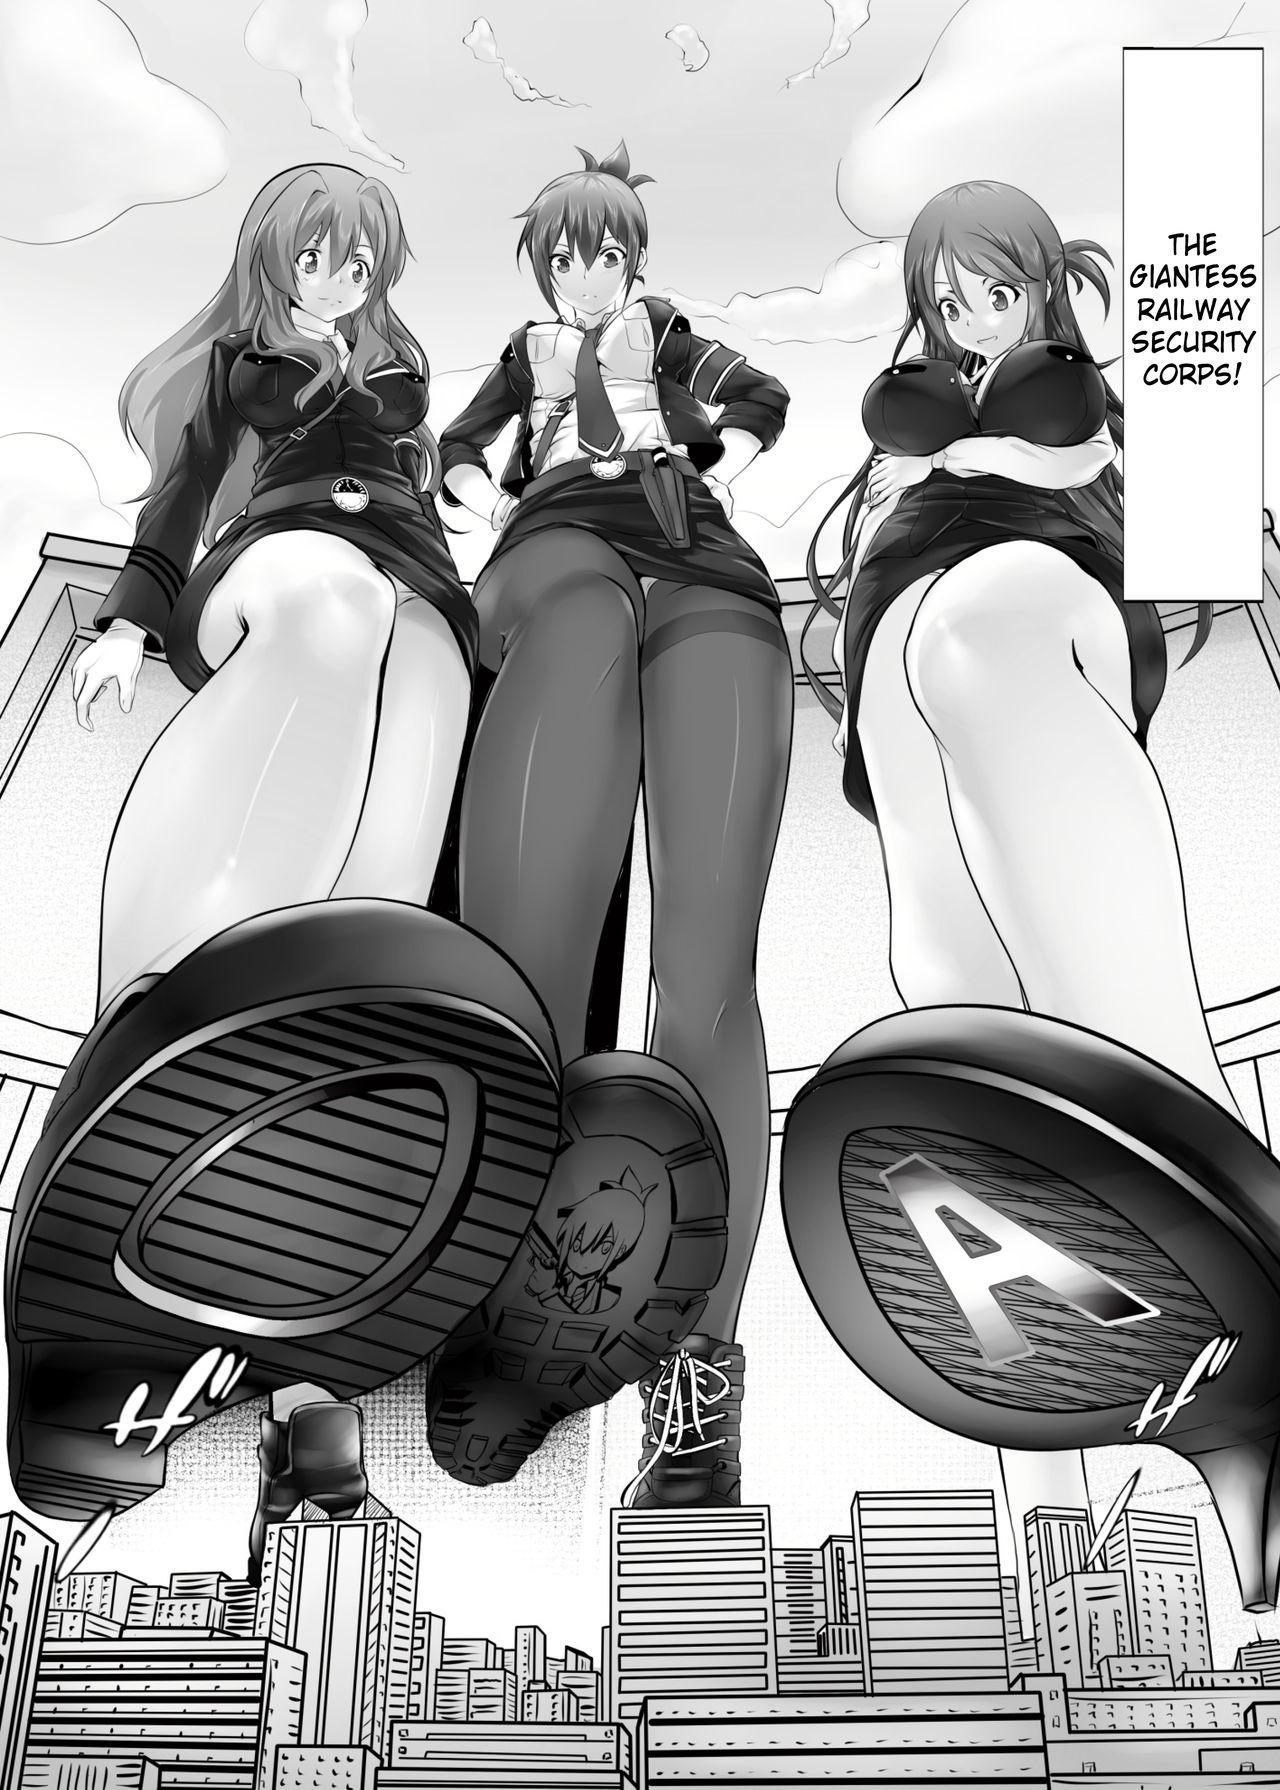 Kyodai Musume Tetsudou Kouantai - Rail Giantess! 3